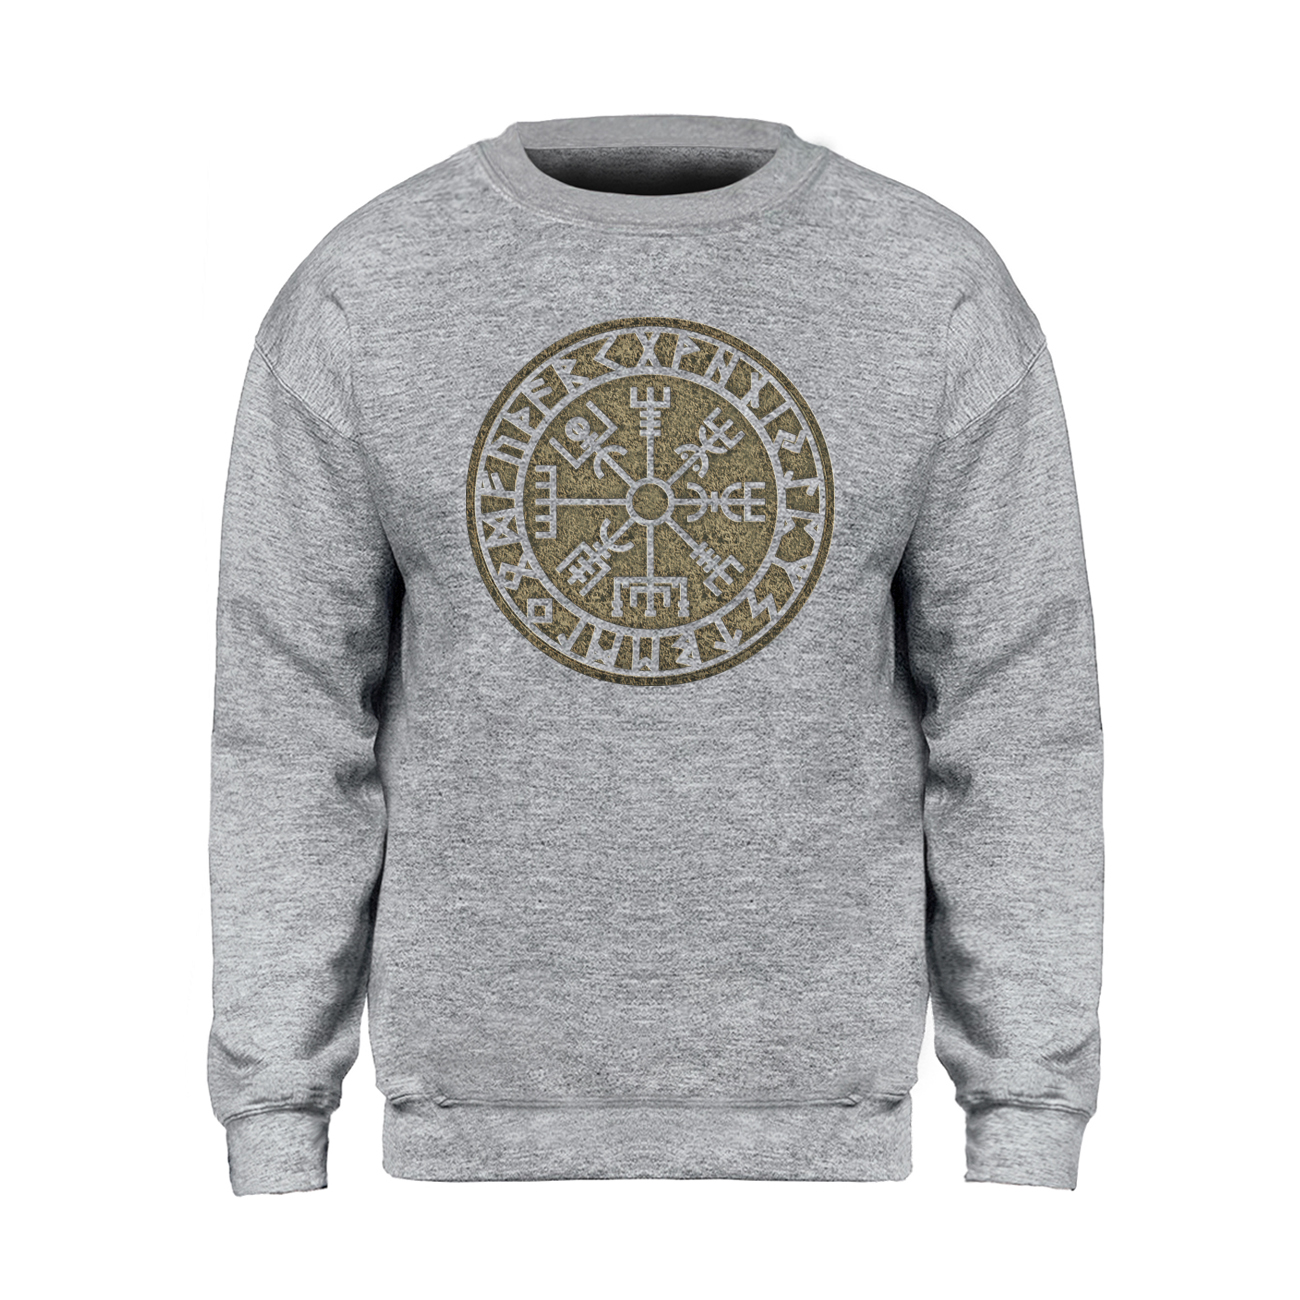 Odin Vikings Sweatshirt Men Valhalla Athelstan Hoodie Crewneck Sweatshirts Winter Autumn Streetwear Die In Battle  Sportswear